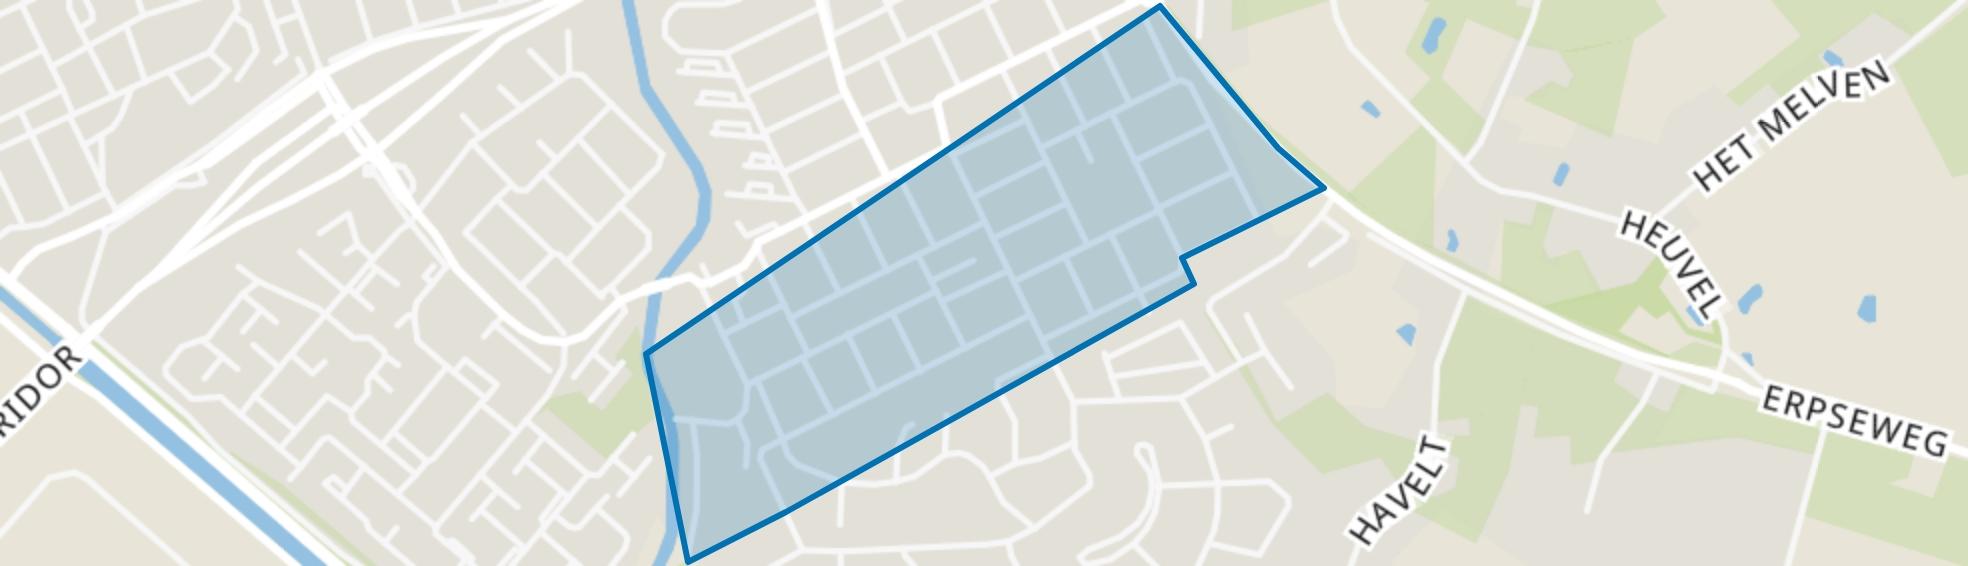 Veghel Zuid 2, Veghel map